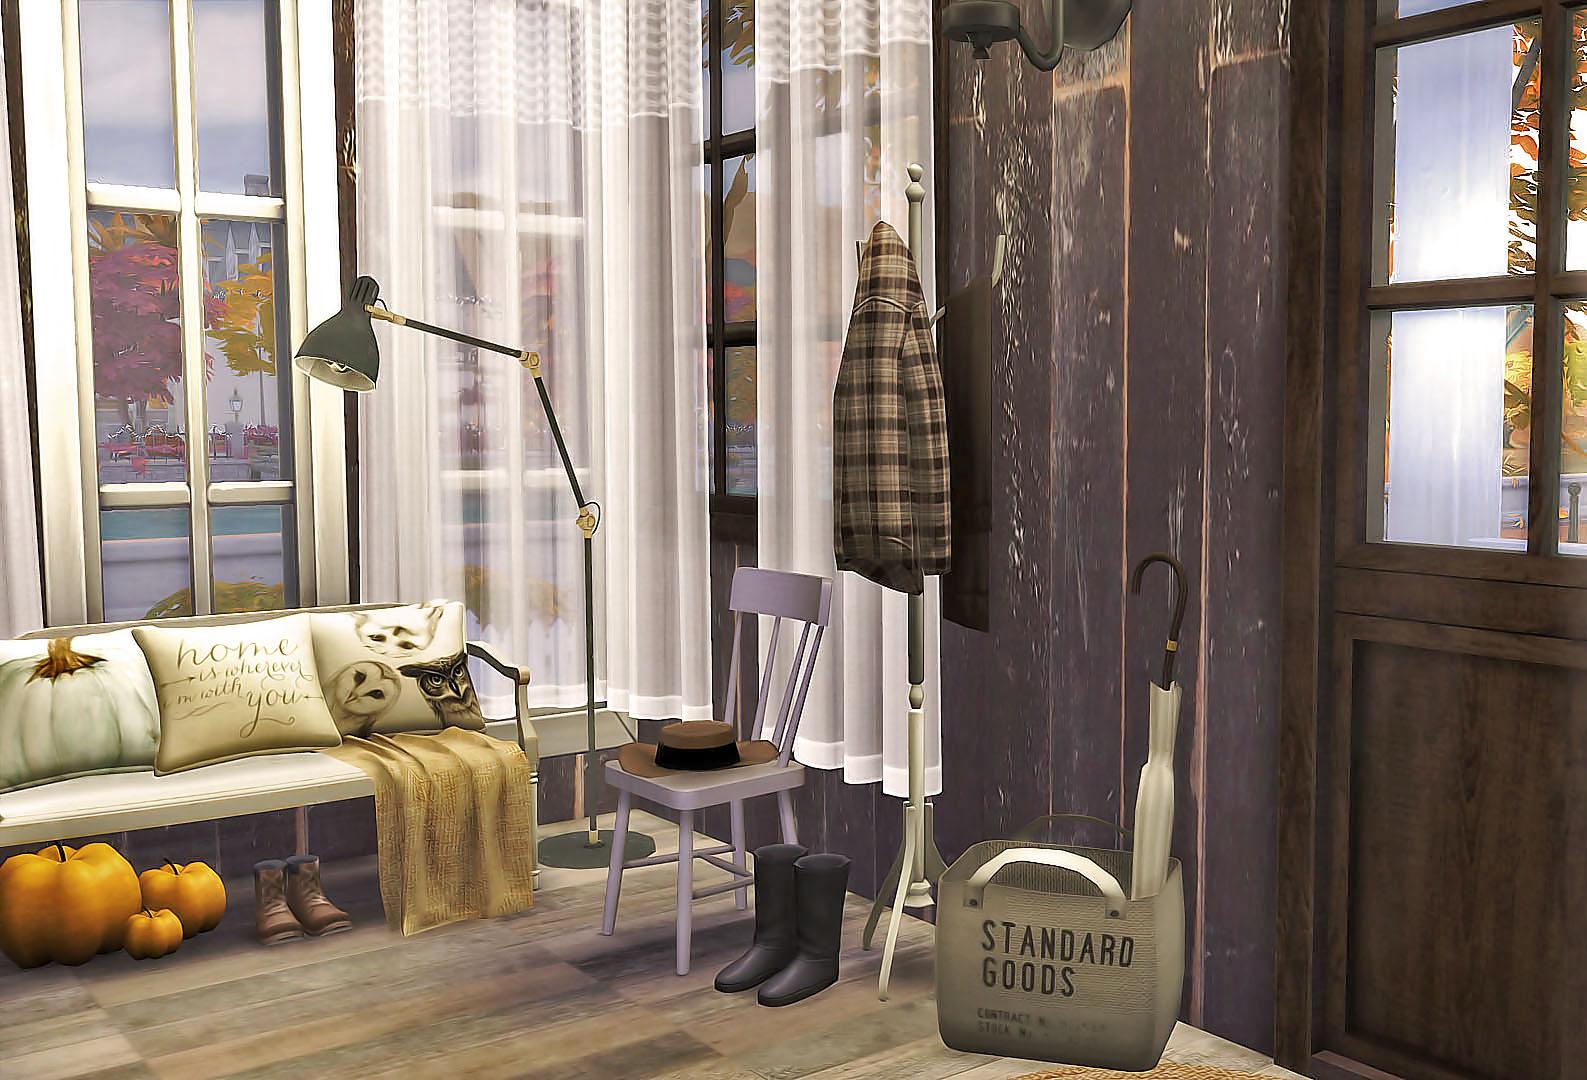 Sims4 Coat Rack Recolors Ruby 39 S Home Design